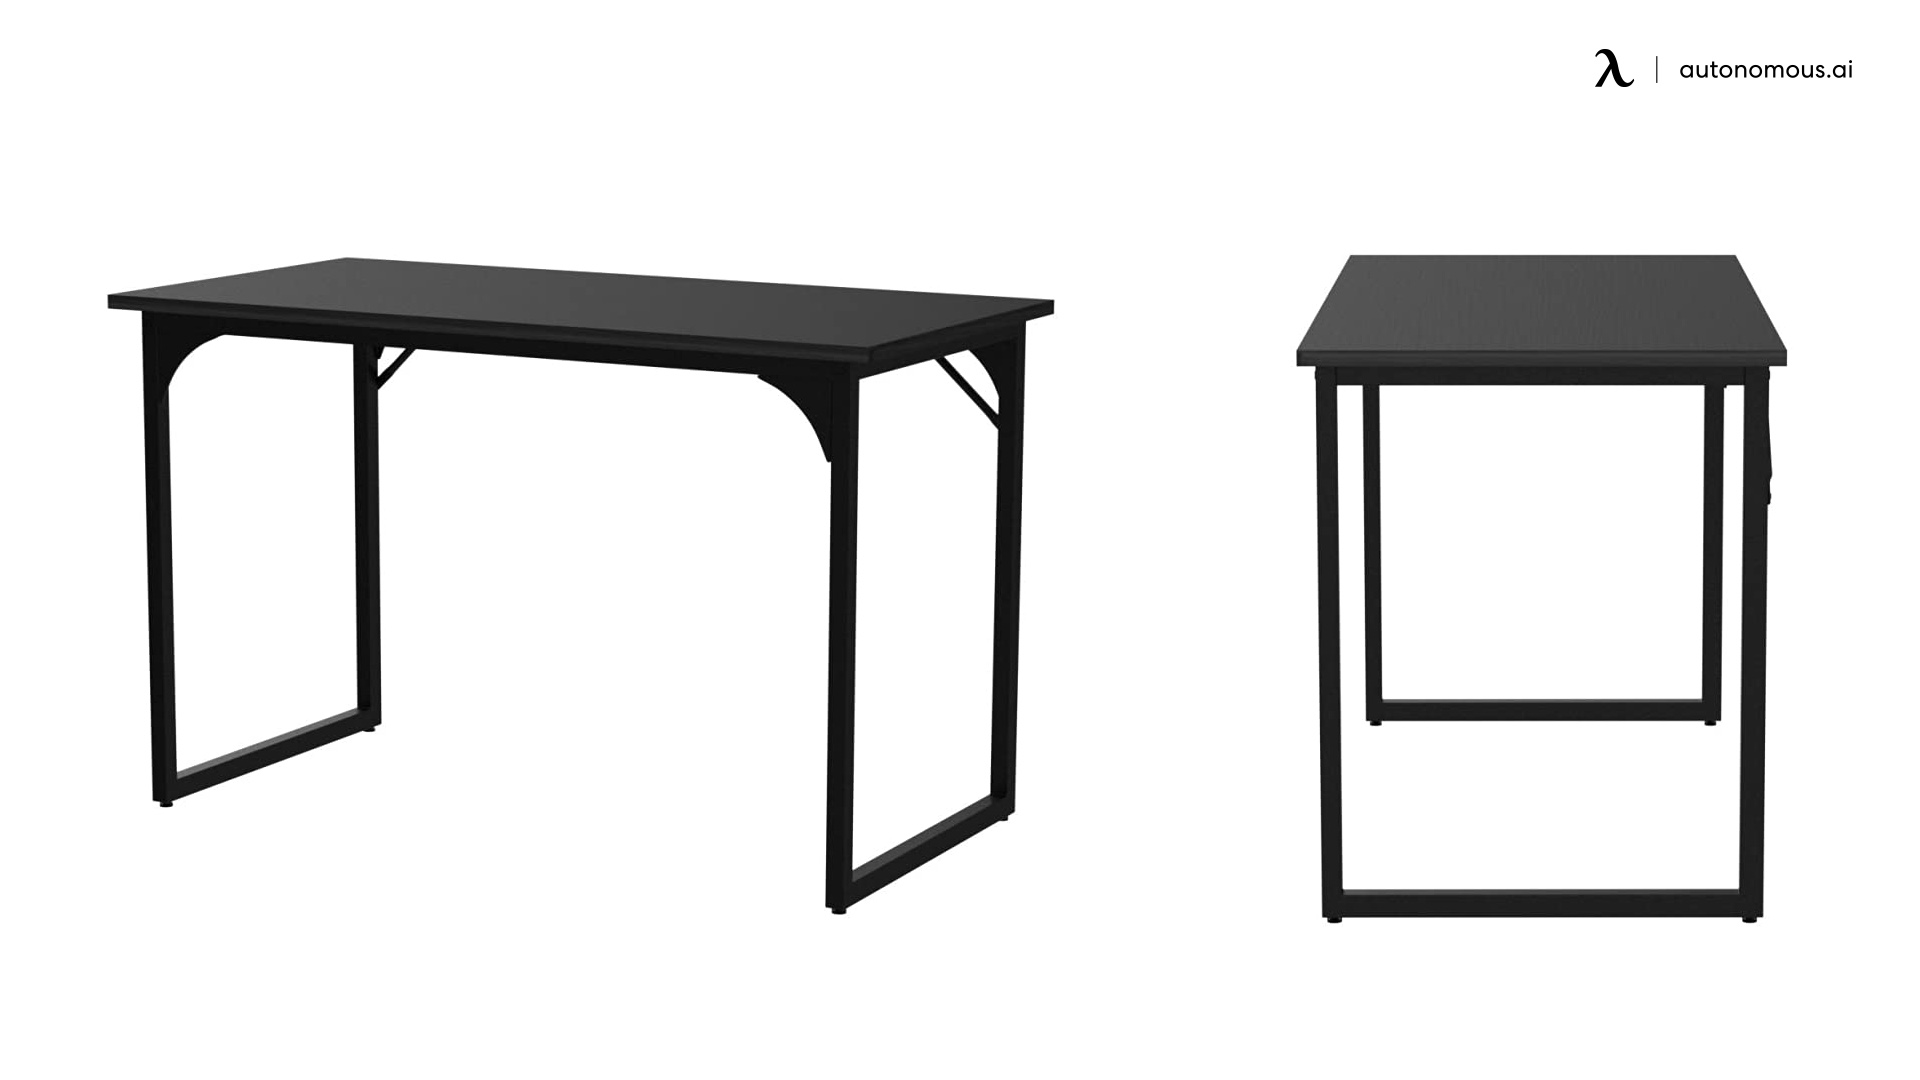 Yitahome Modern All Black Desk